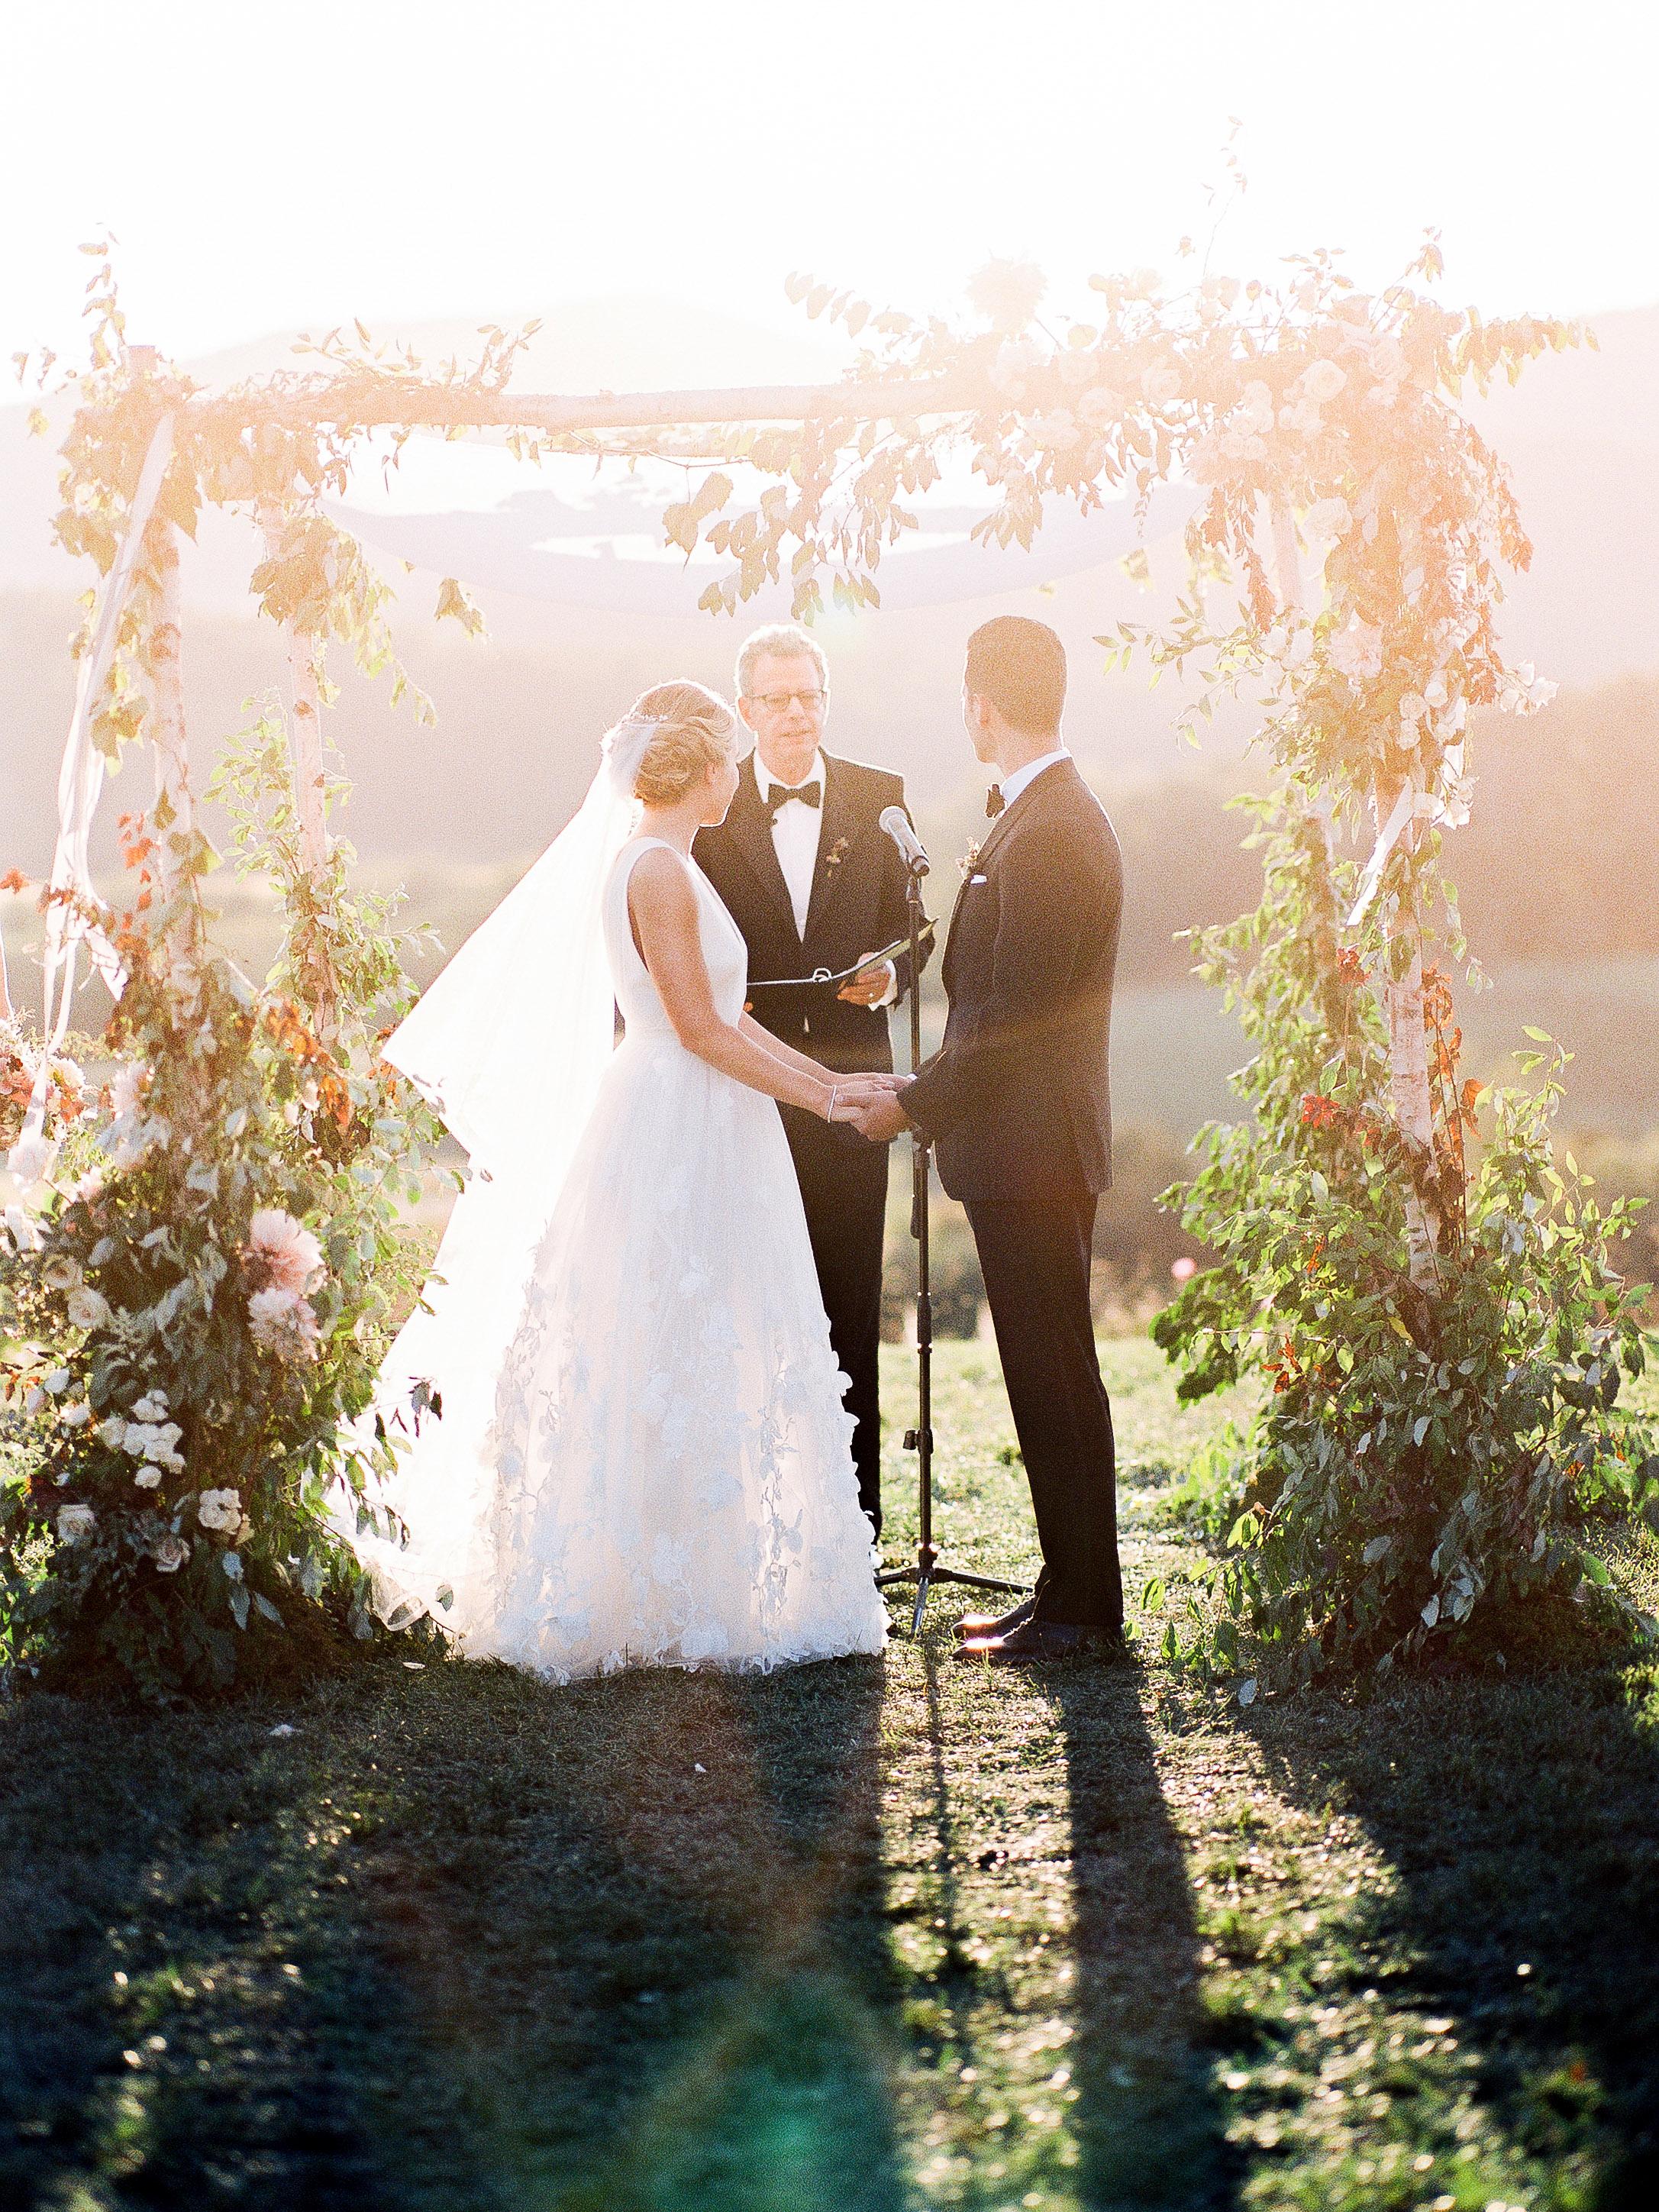 julianne aaron wedding ceremony couple arch